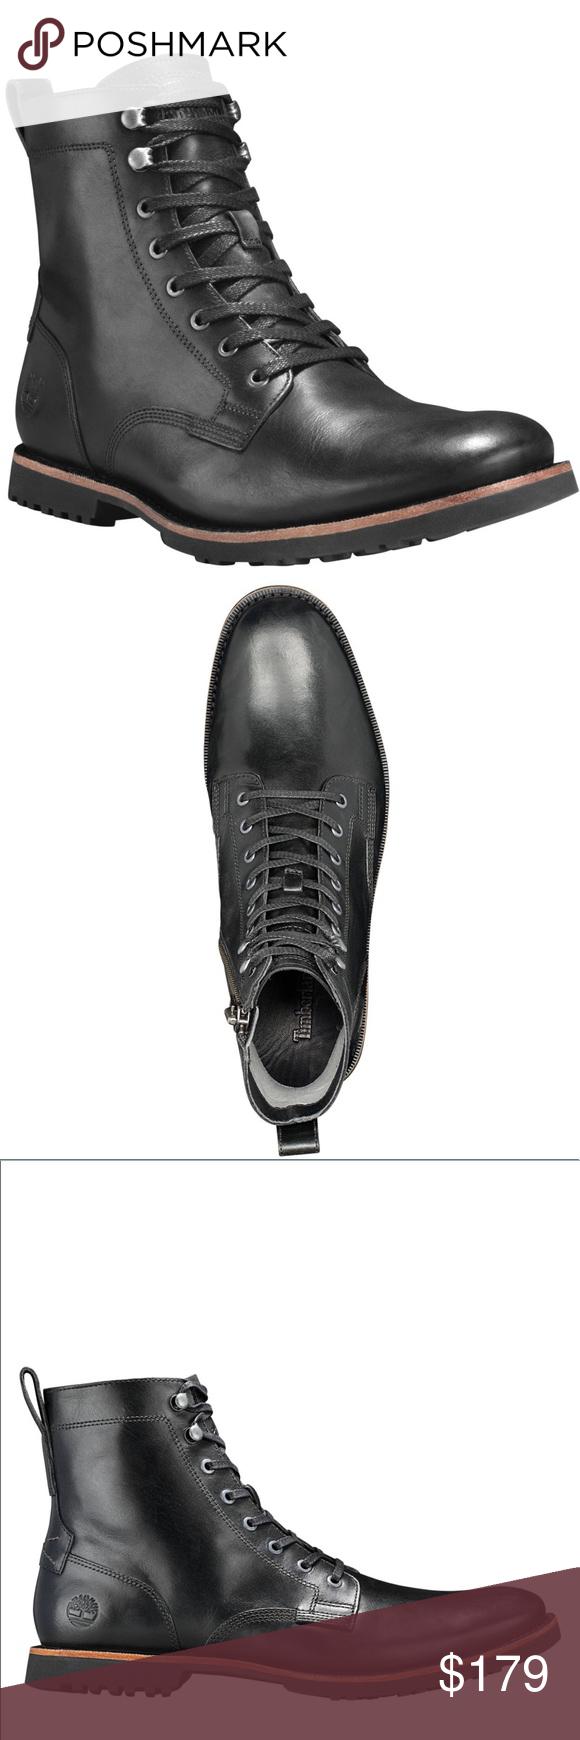 b38898ec78 TIMBERLAND MEN'S KENDRICK SIDE-ZIP BOOTS Premium full-grain leather uppers  Side zips OrthoLite